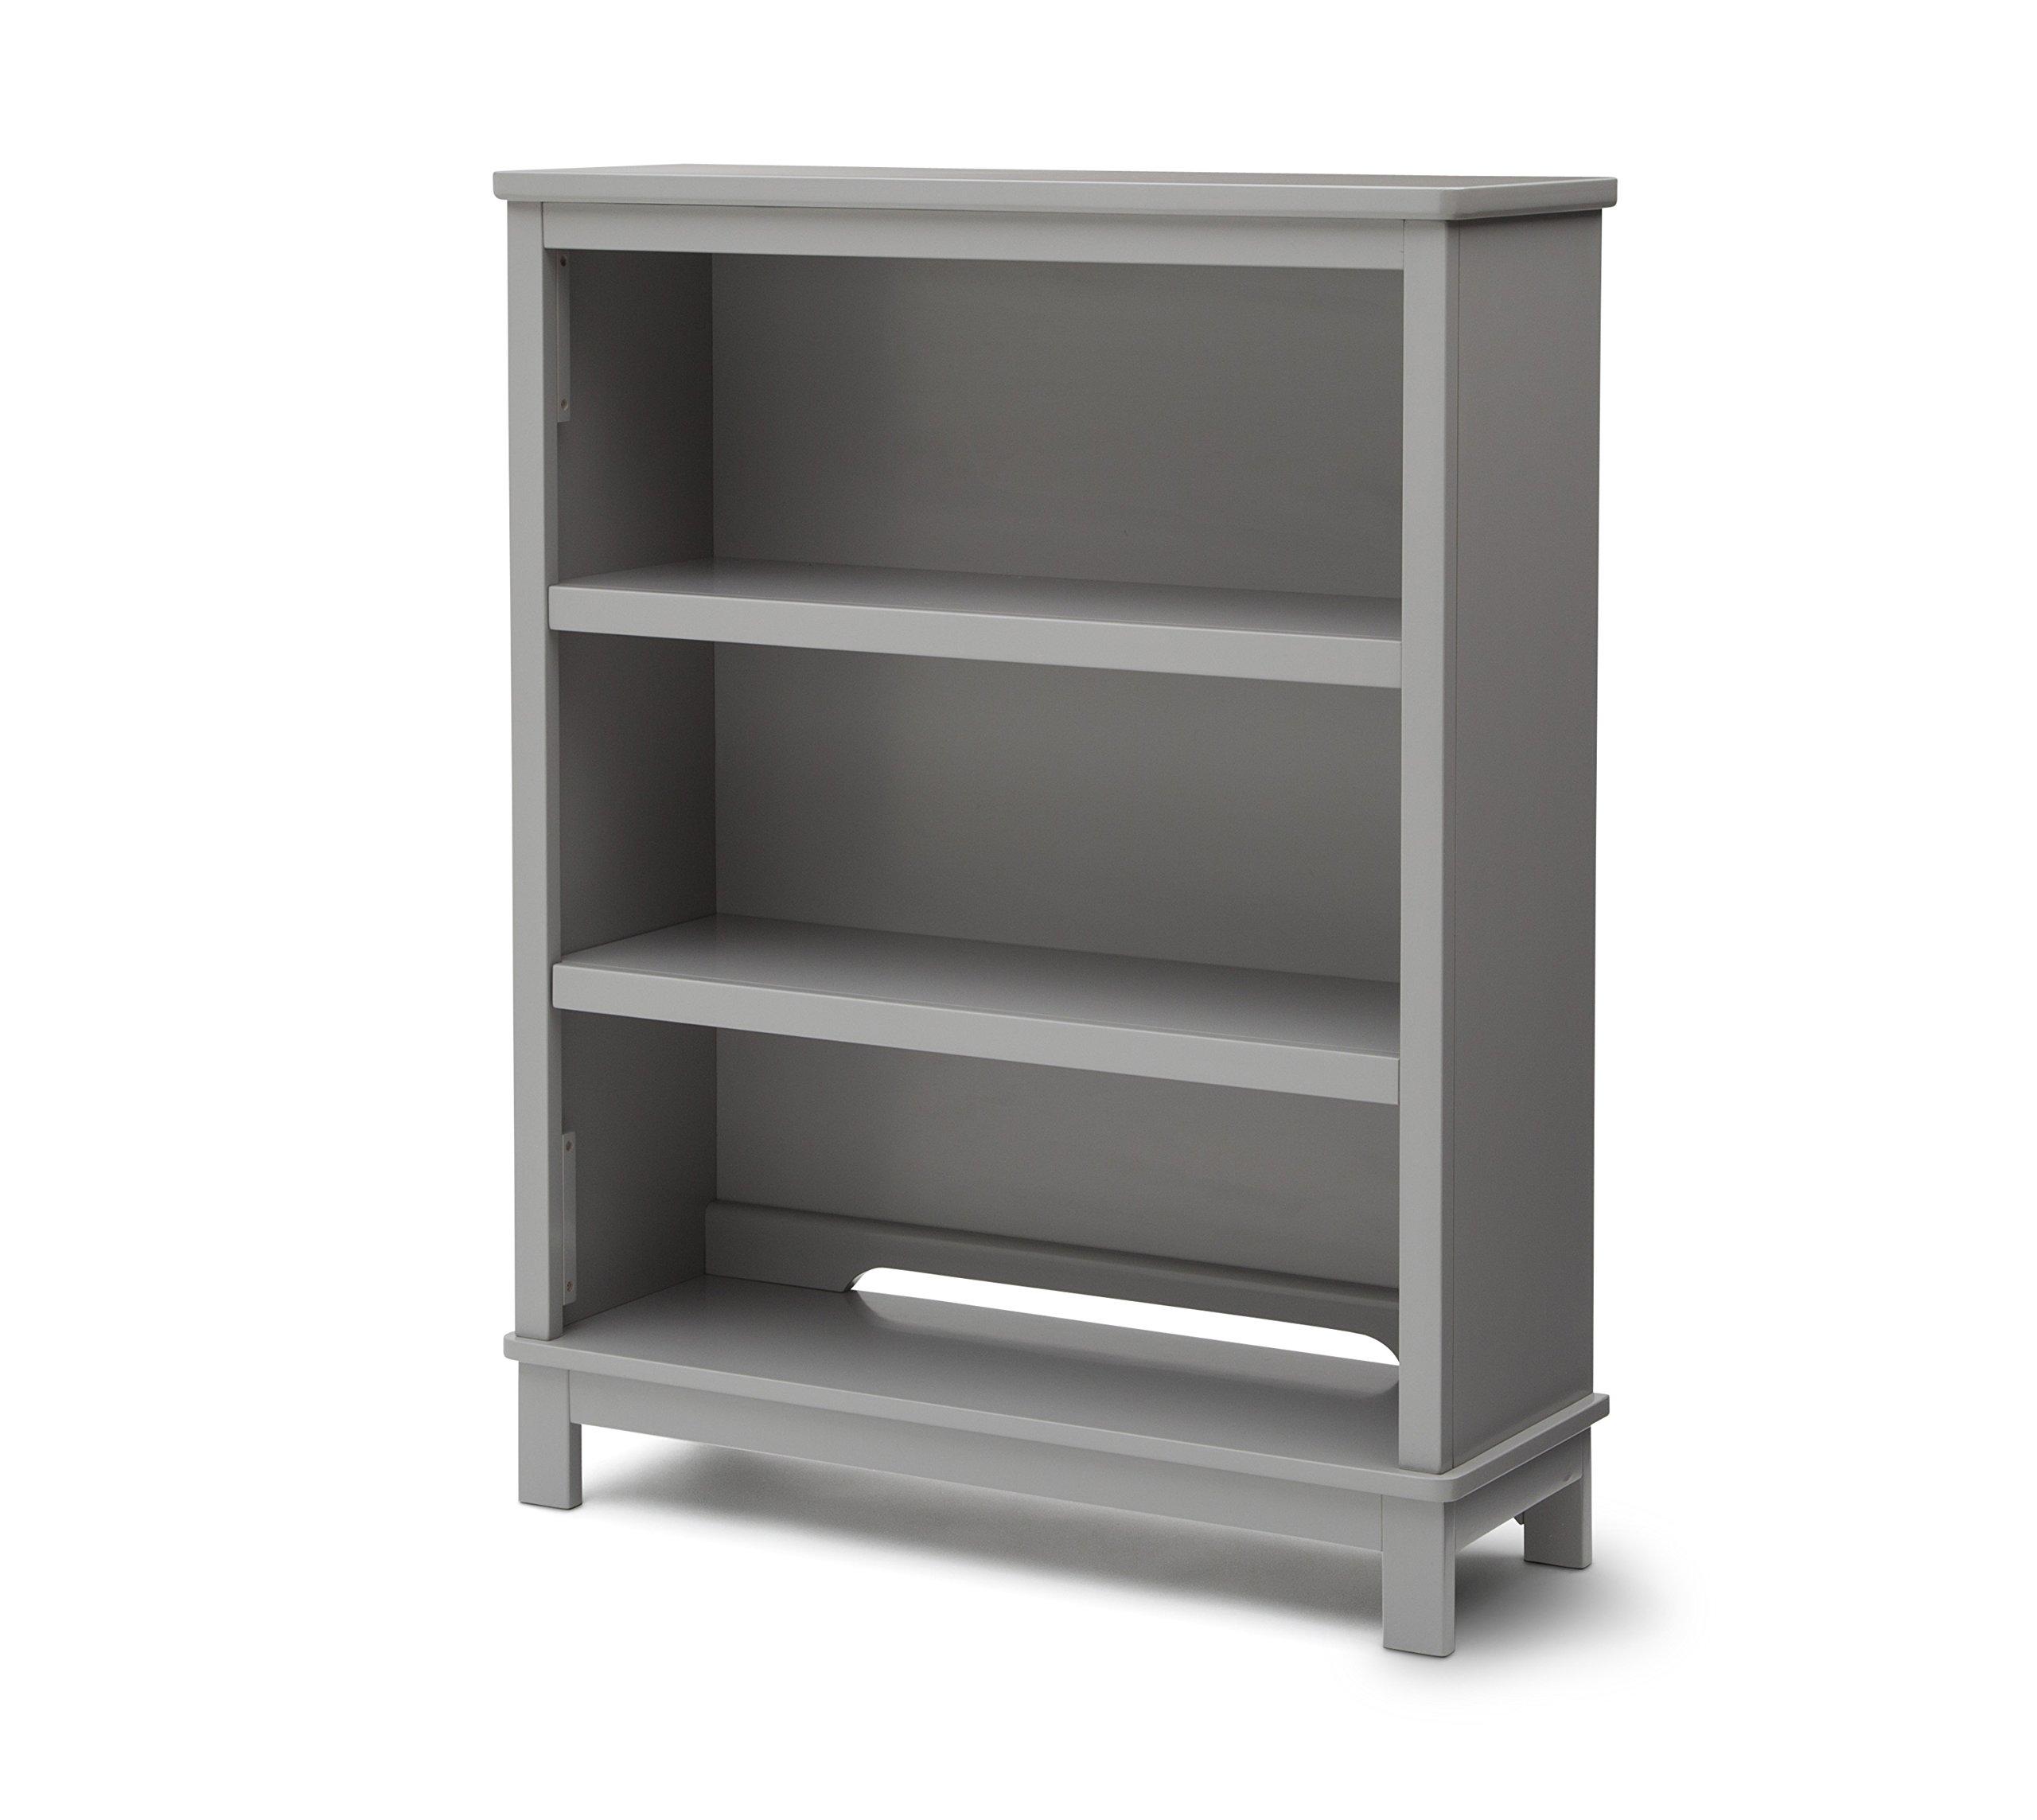 Delta Children Epic Bookcase / Hutch For Books and Toys - Grey